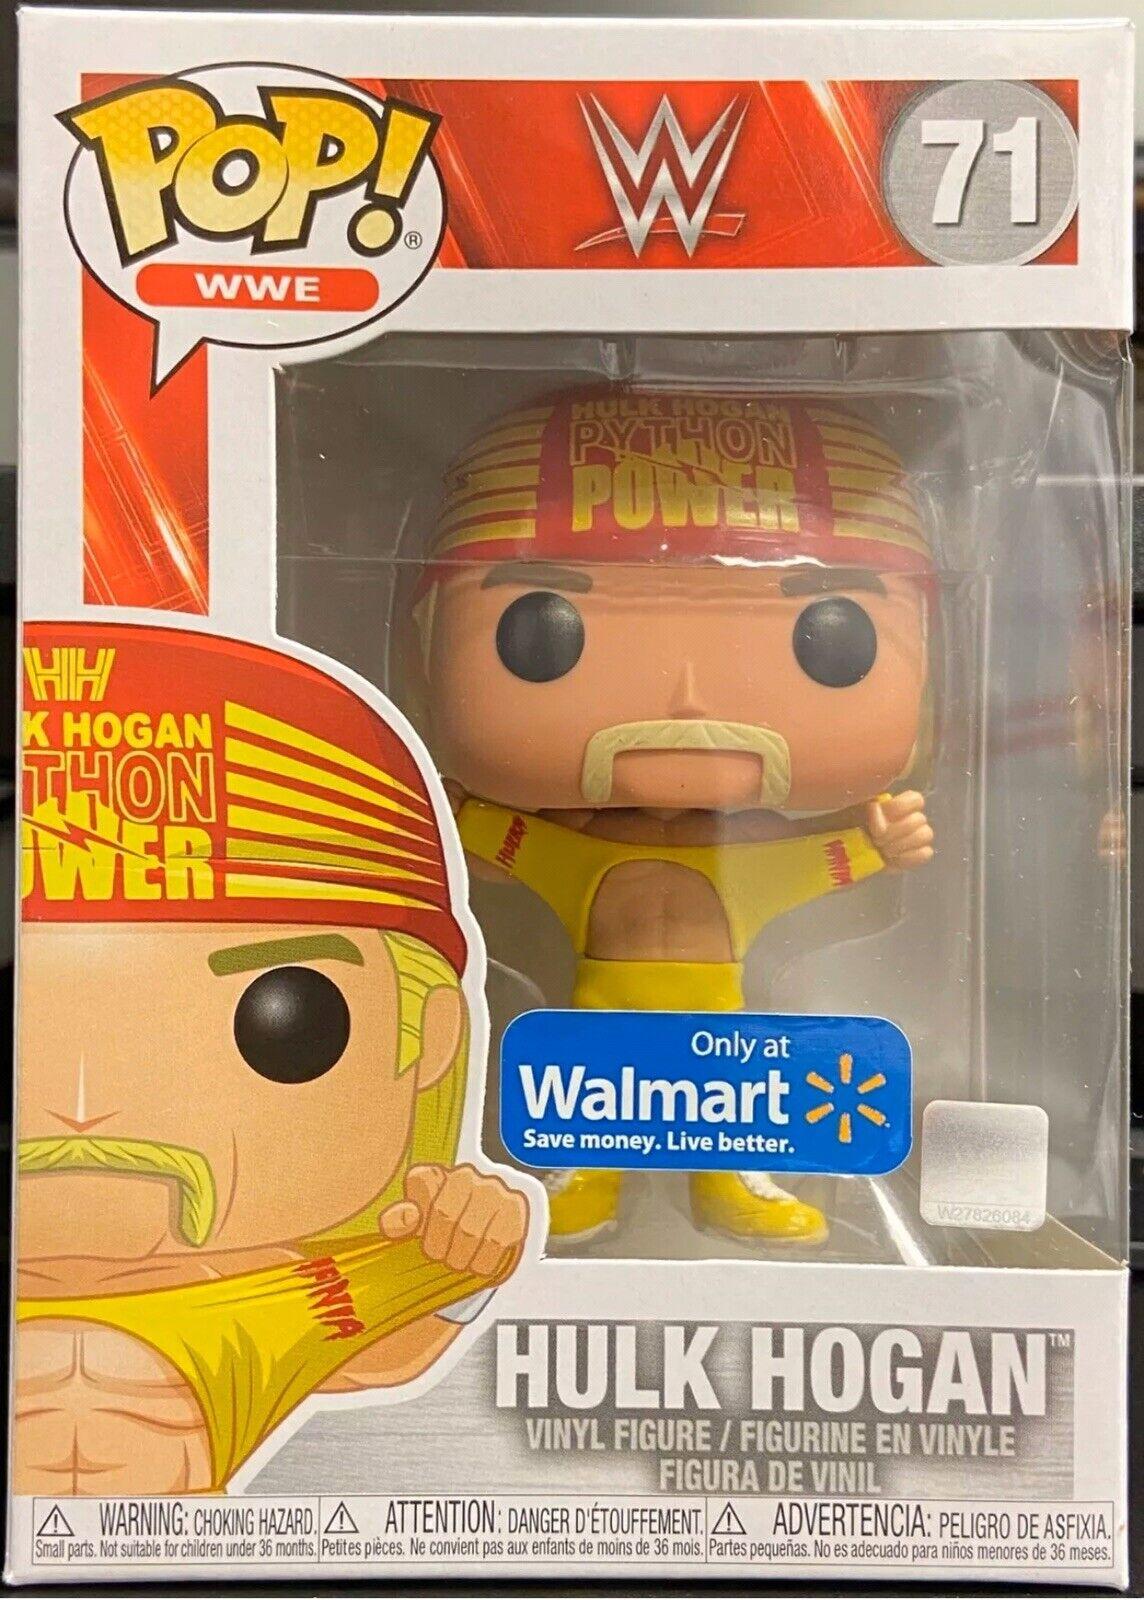 Hulk Hogan Wrestlemania 3 US Exclusive Pop WWE Vinyl